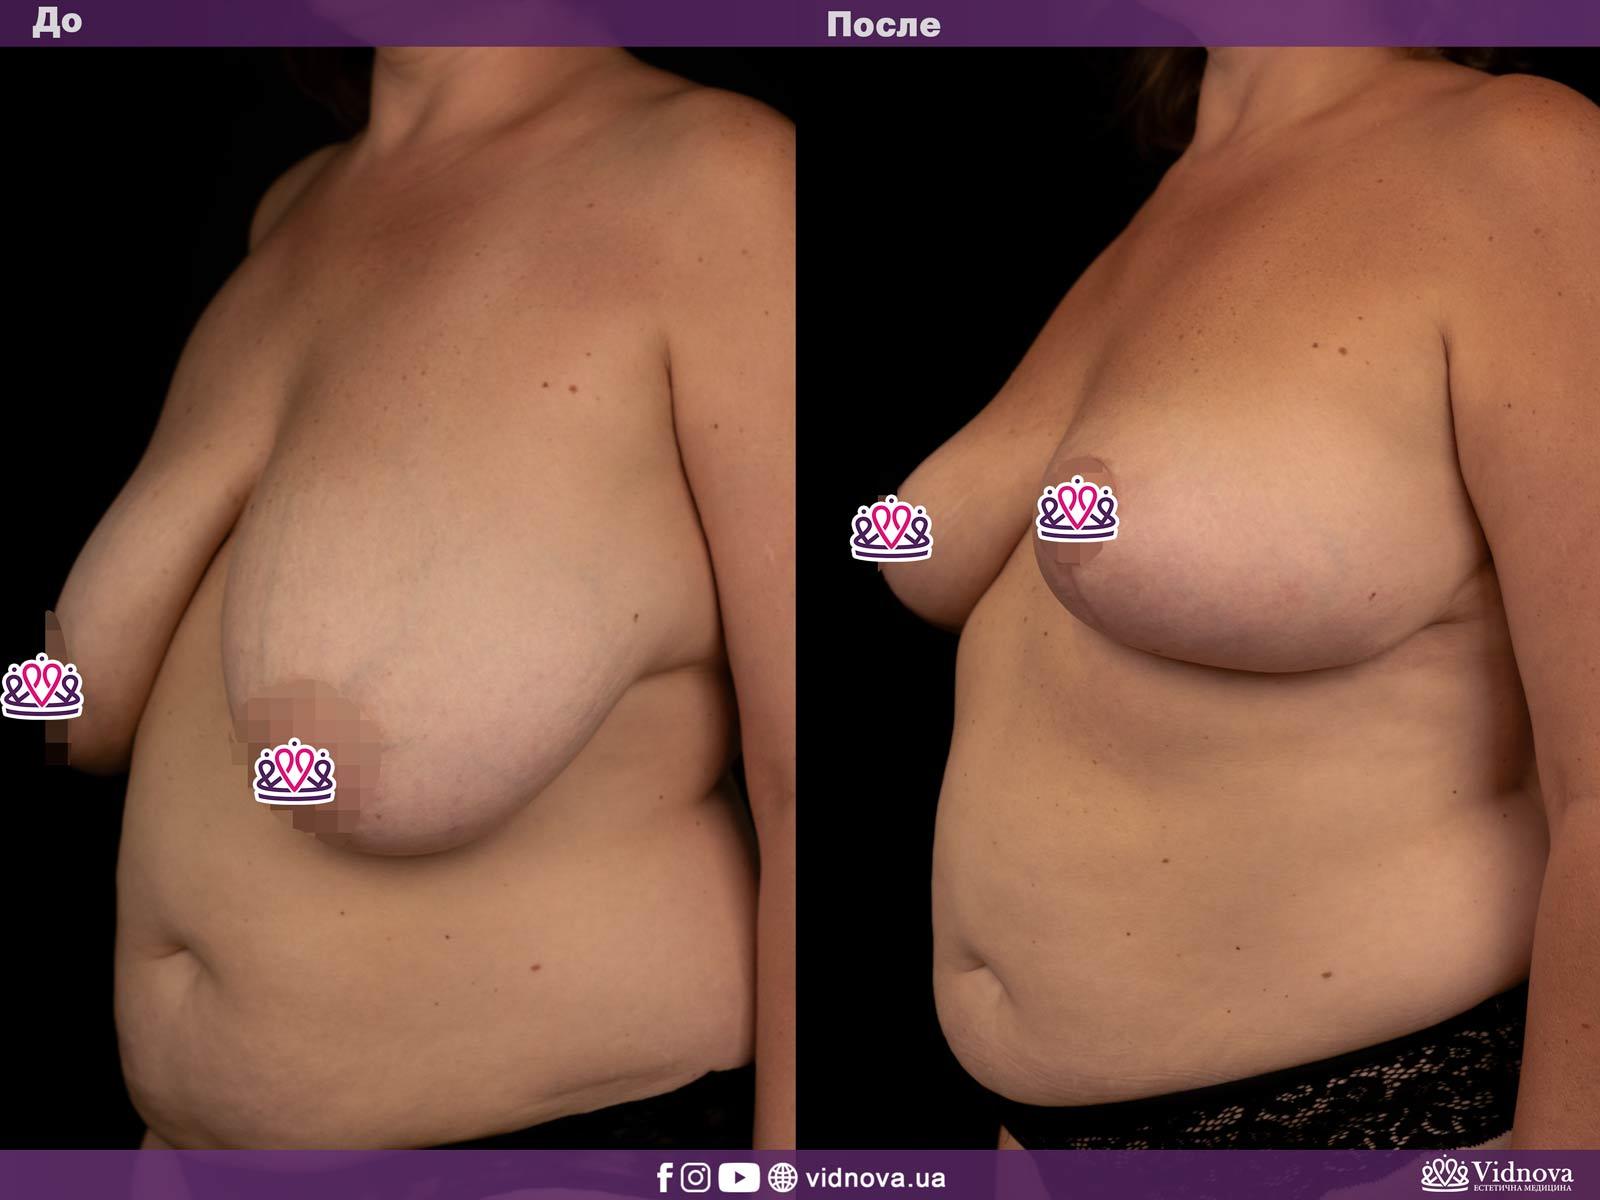 Уменьшение груди: Фото ДО и ПОСЛЕ - Пример №1-2 - Клиника Vidnova